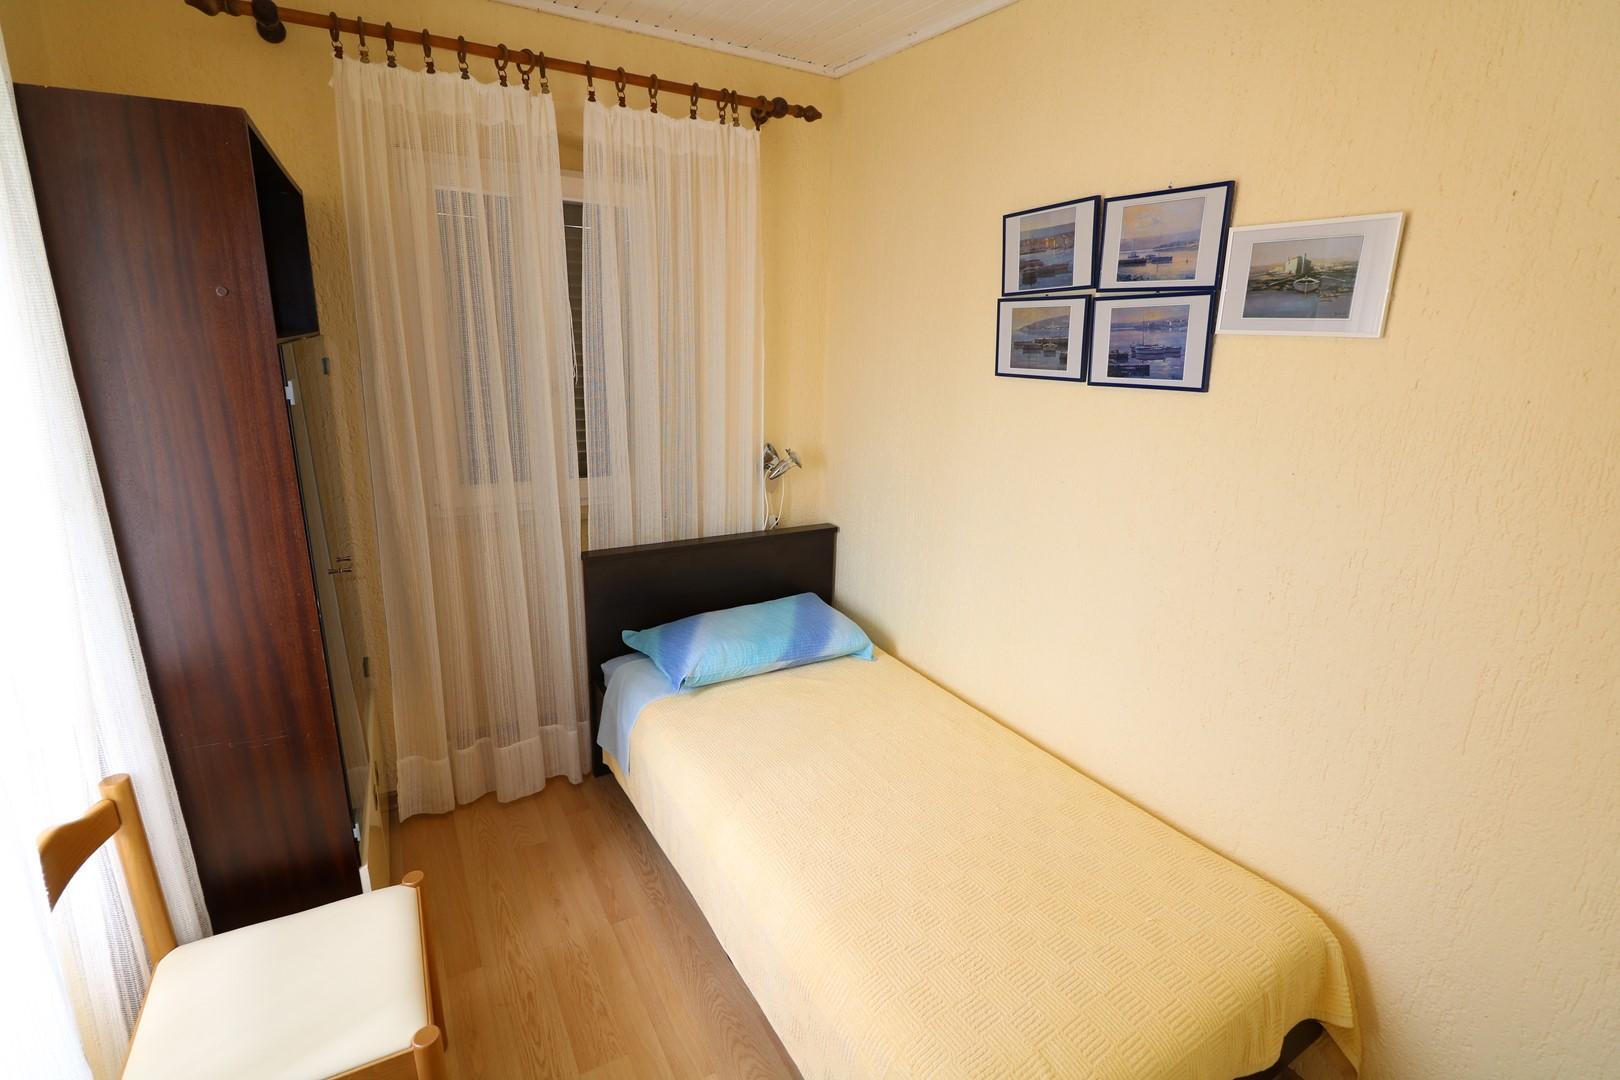 Ferienwohnung Apartments Ivo with the Sea View / Apartment Ivo with Beautiful Sea View (2616230), Baška, Insel Krk, Kvarner, Kroatien, Bild 8